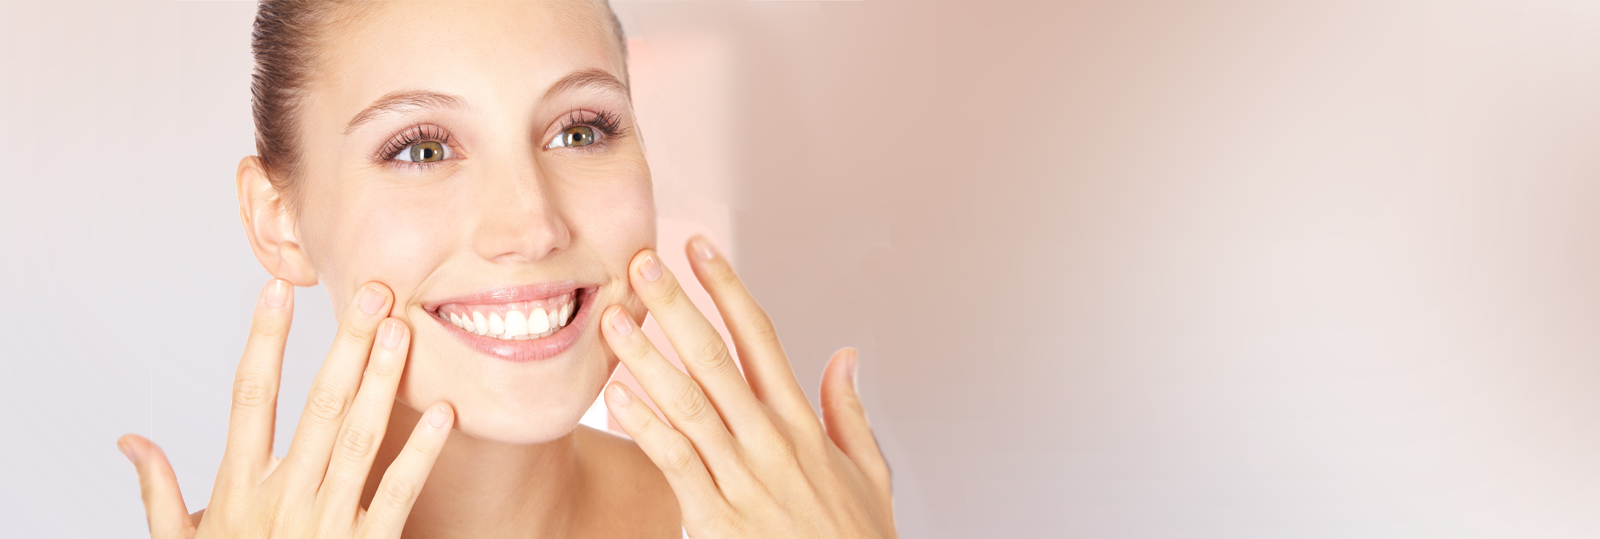 Dermal Filler at Radian Beauty Renewal